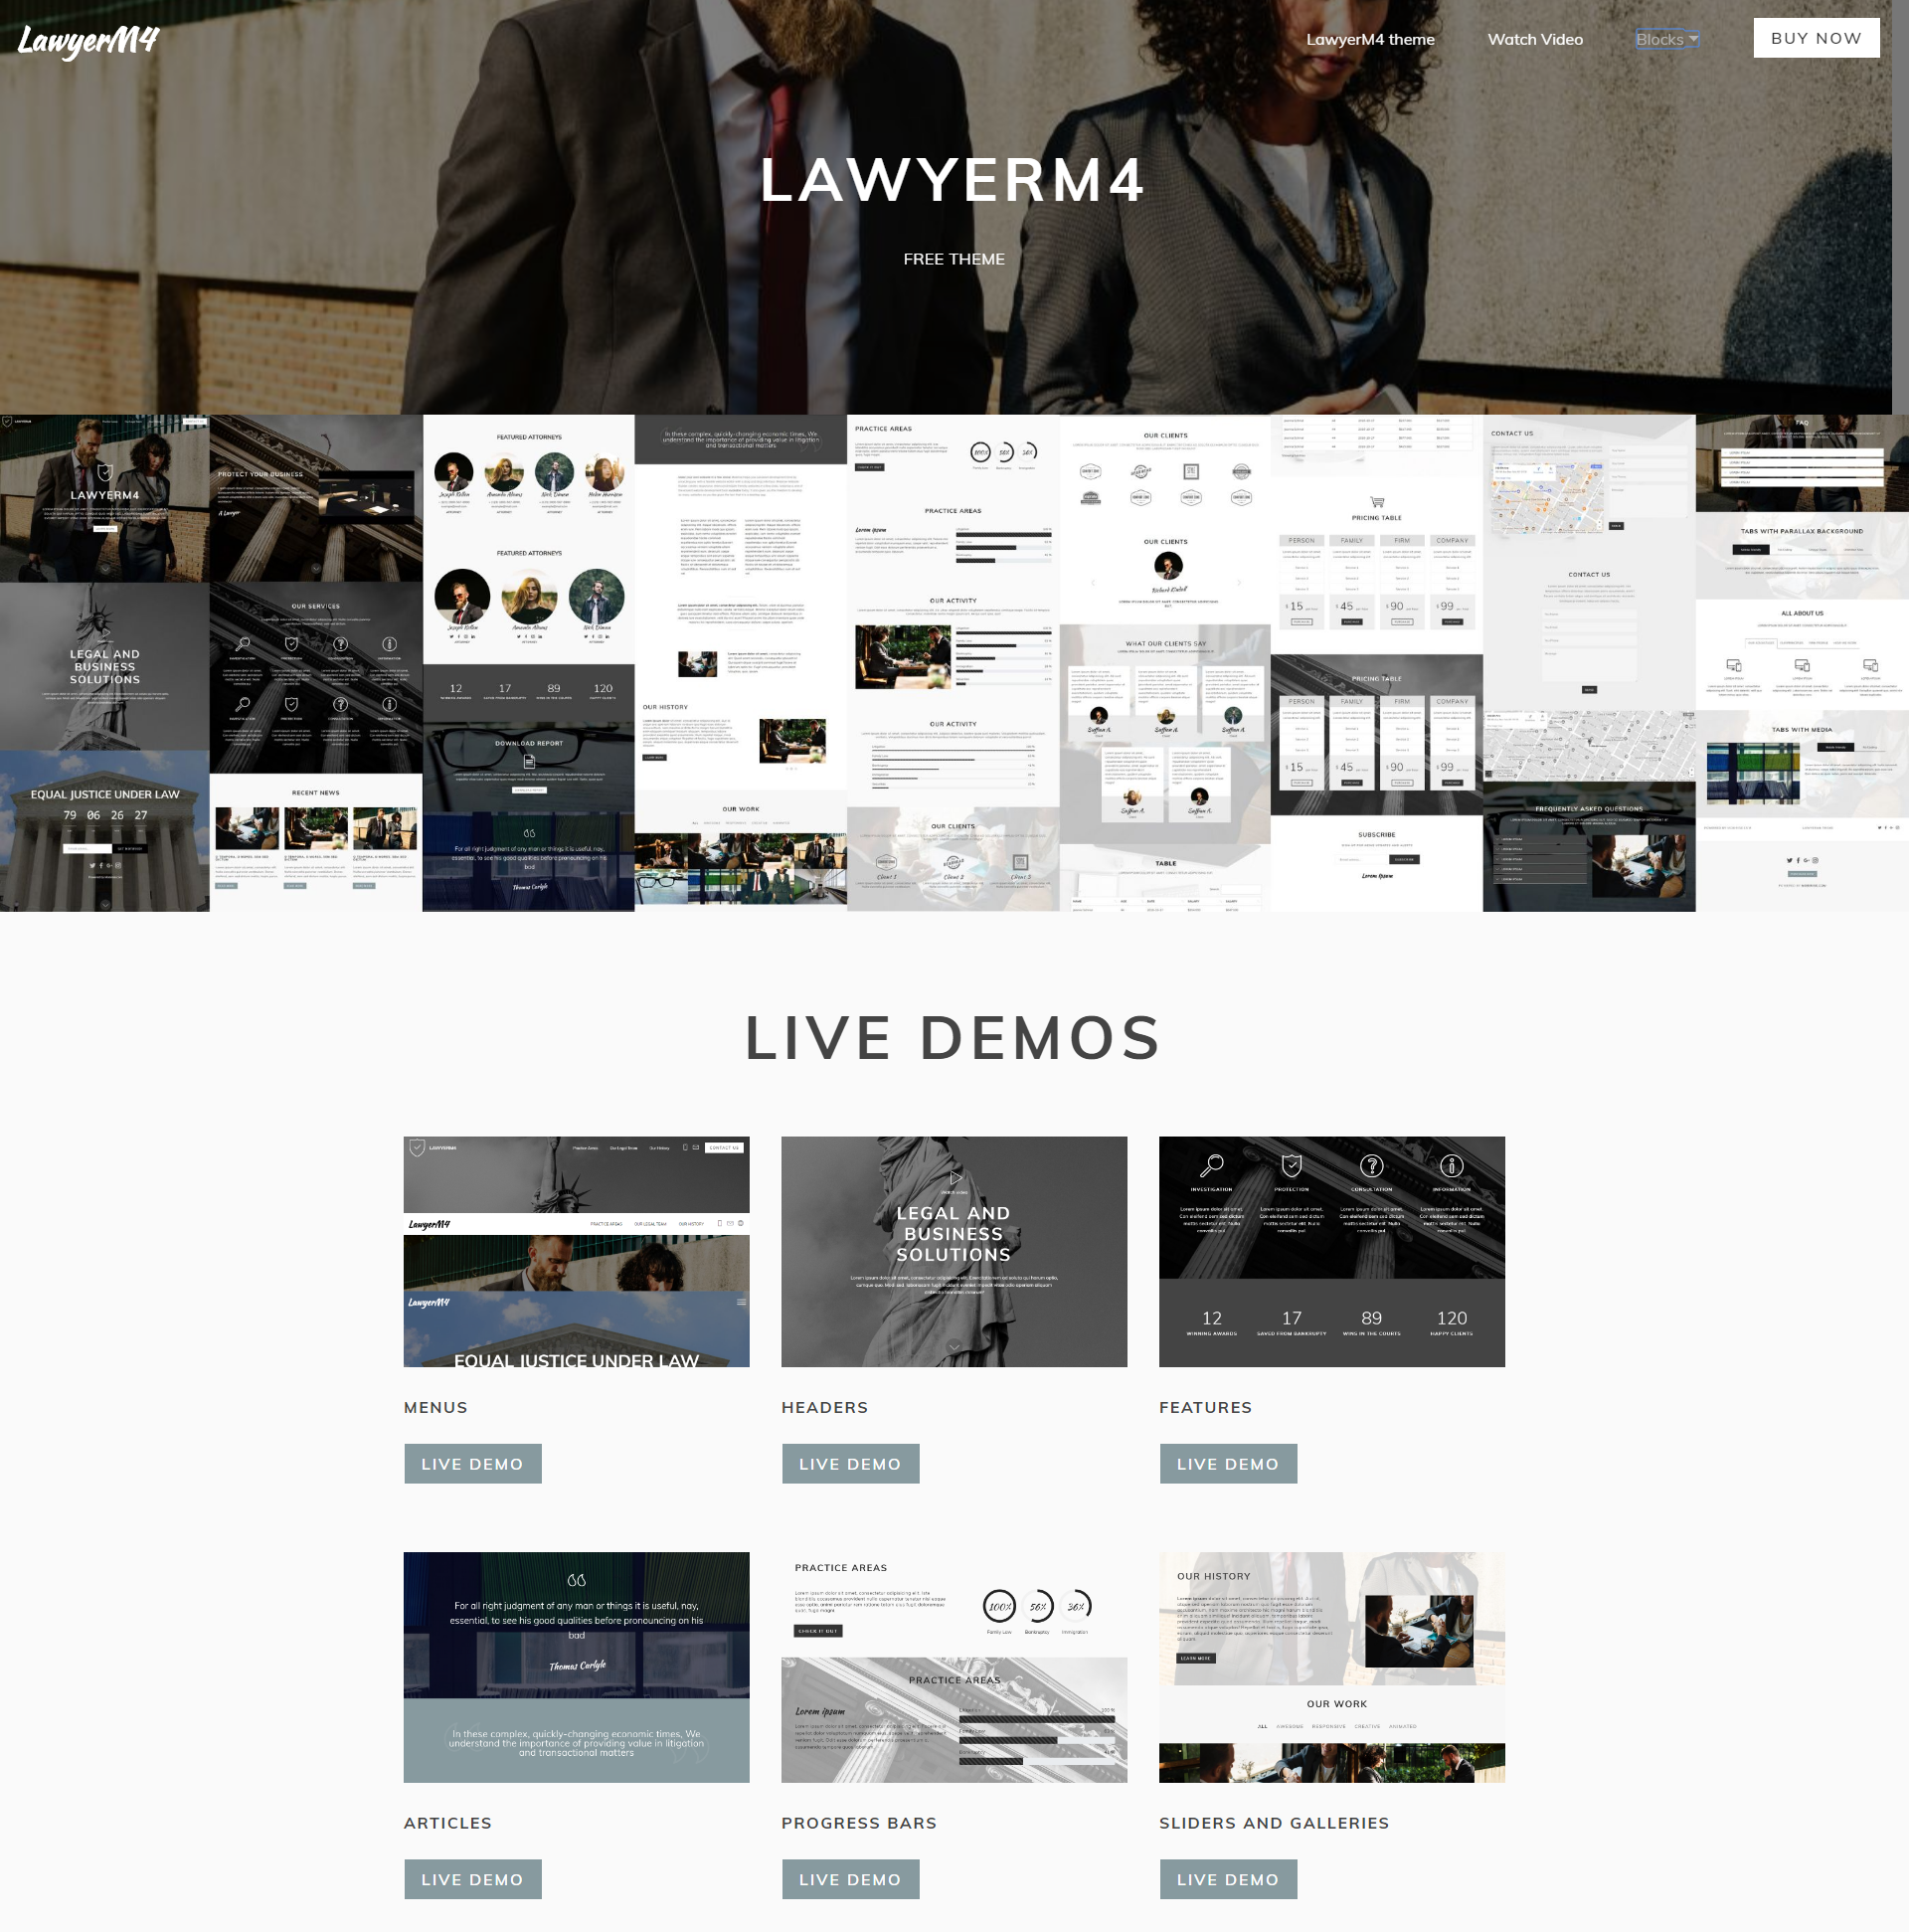 HTML5 Bootstrap LawyerM4 Themes